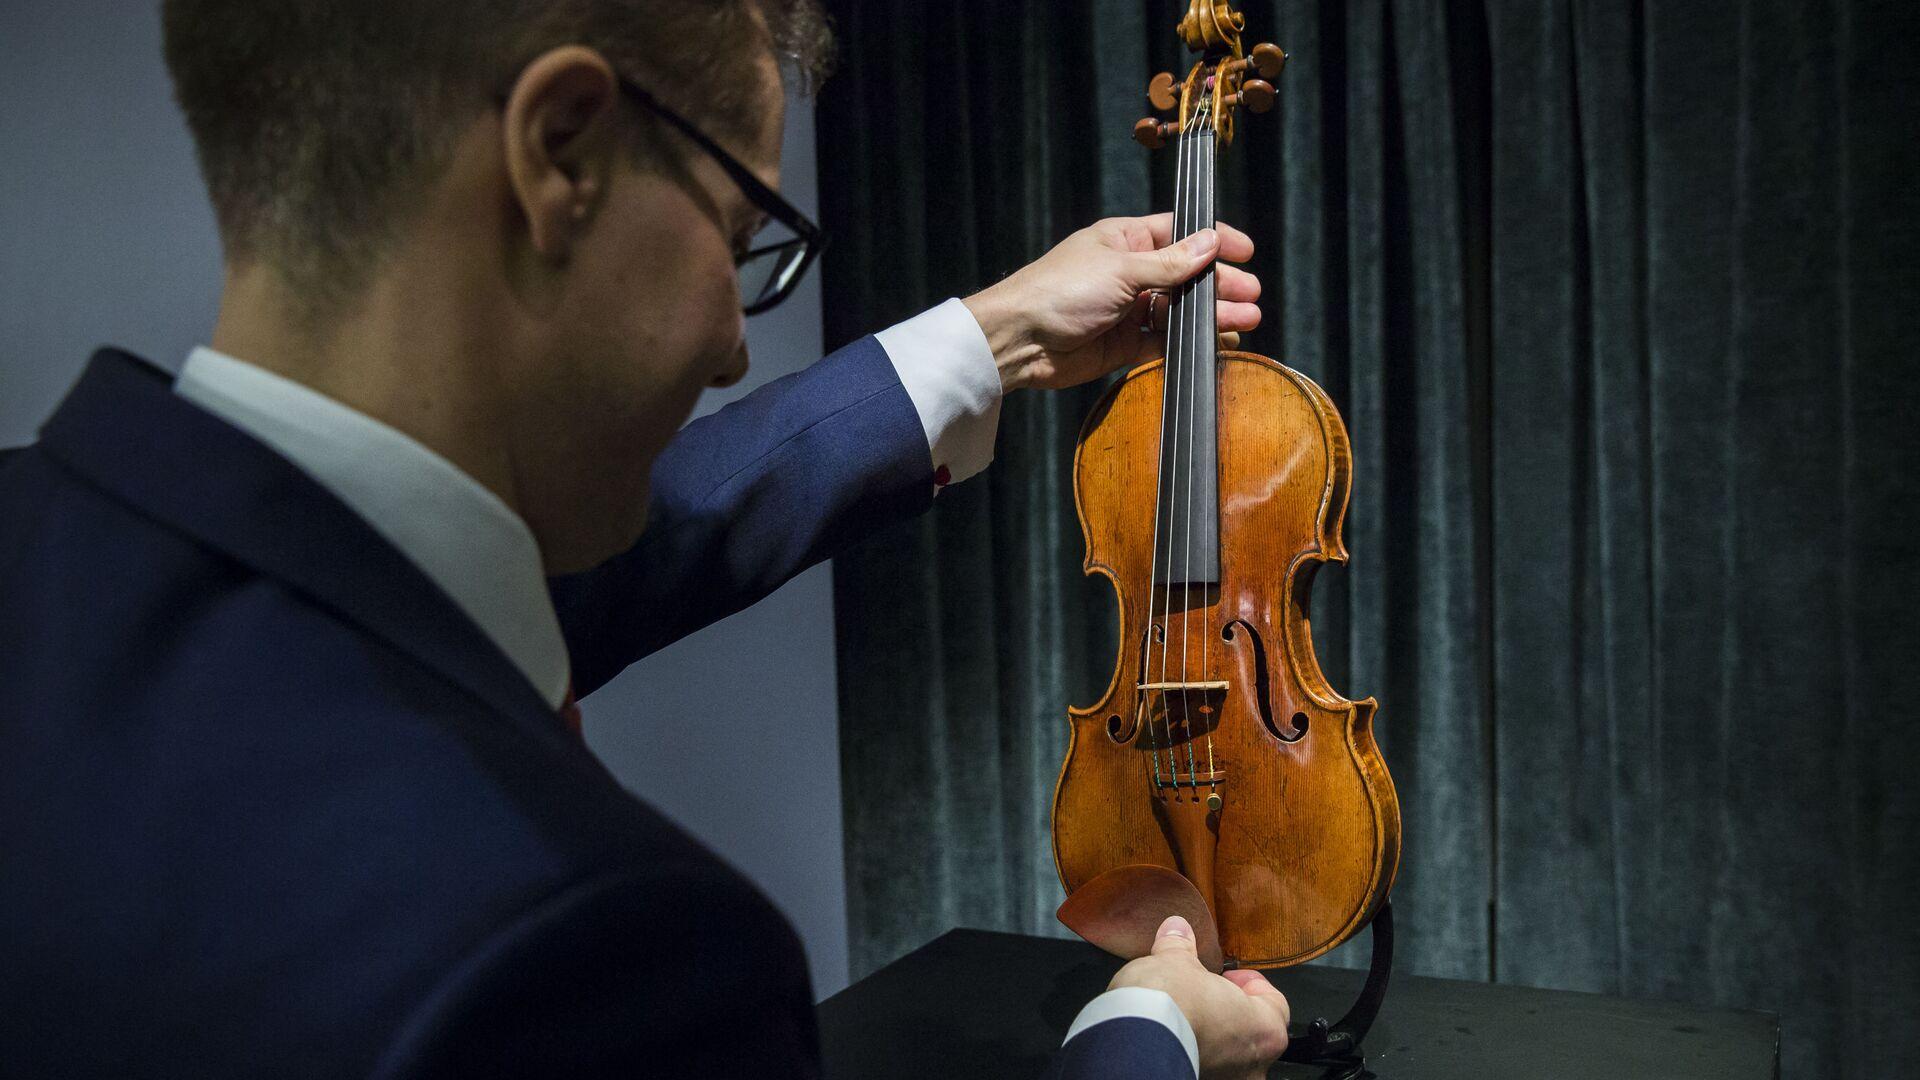 Skrzypce Stradivariego - Sputnik Polska, 1920, 24.08.2021